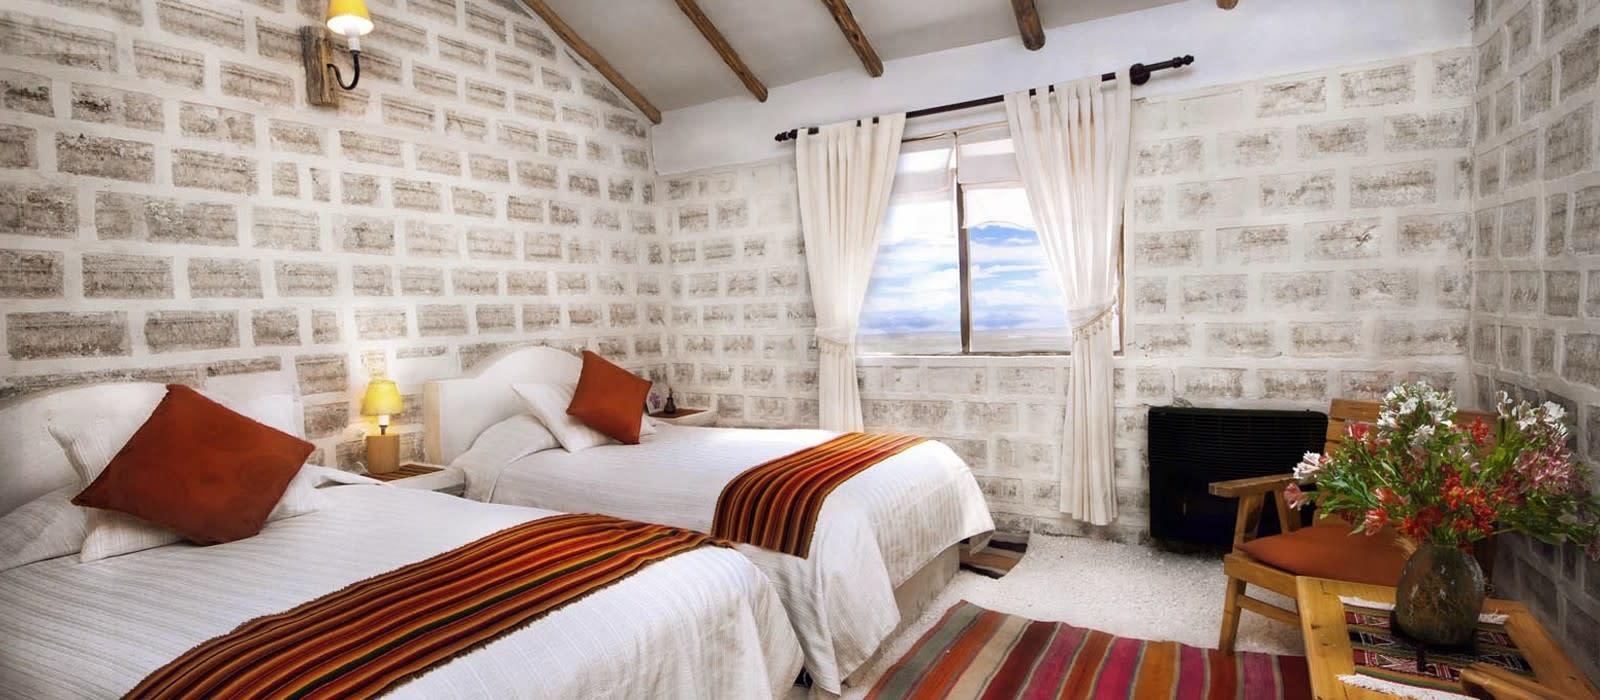 Hotel Luna Salada Bolivia